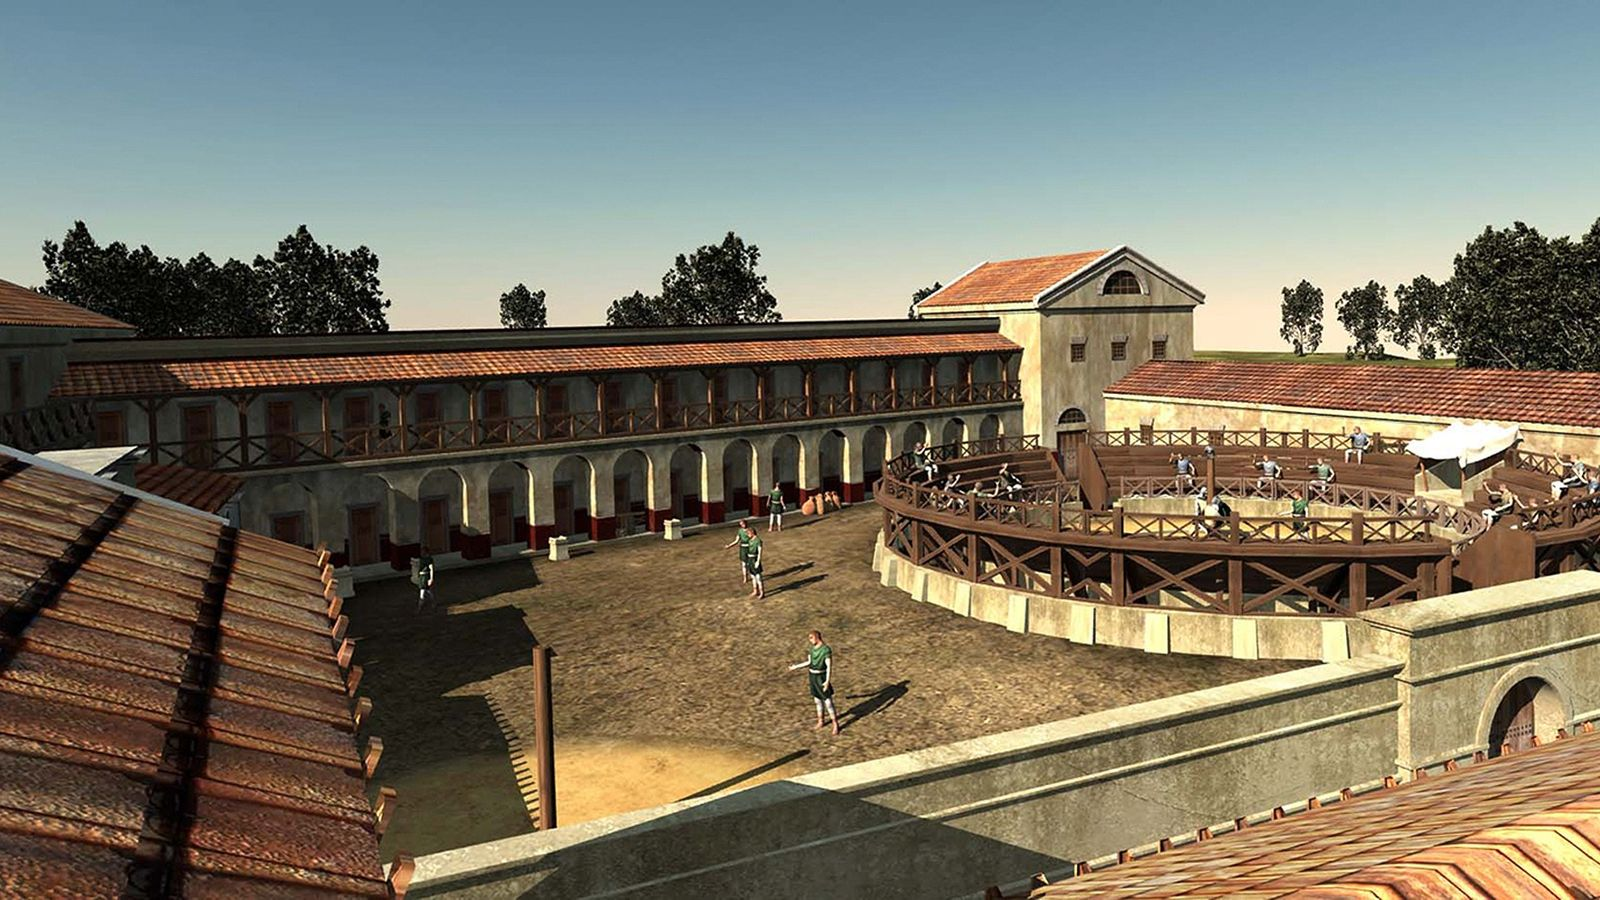 escola-de-gladiadores-roma-antiga-ilustracao